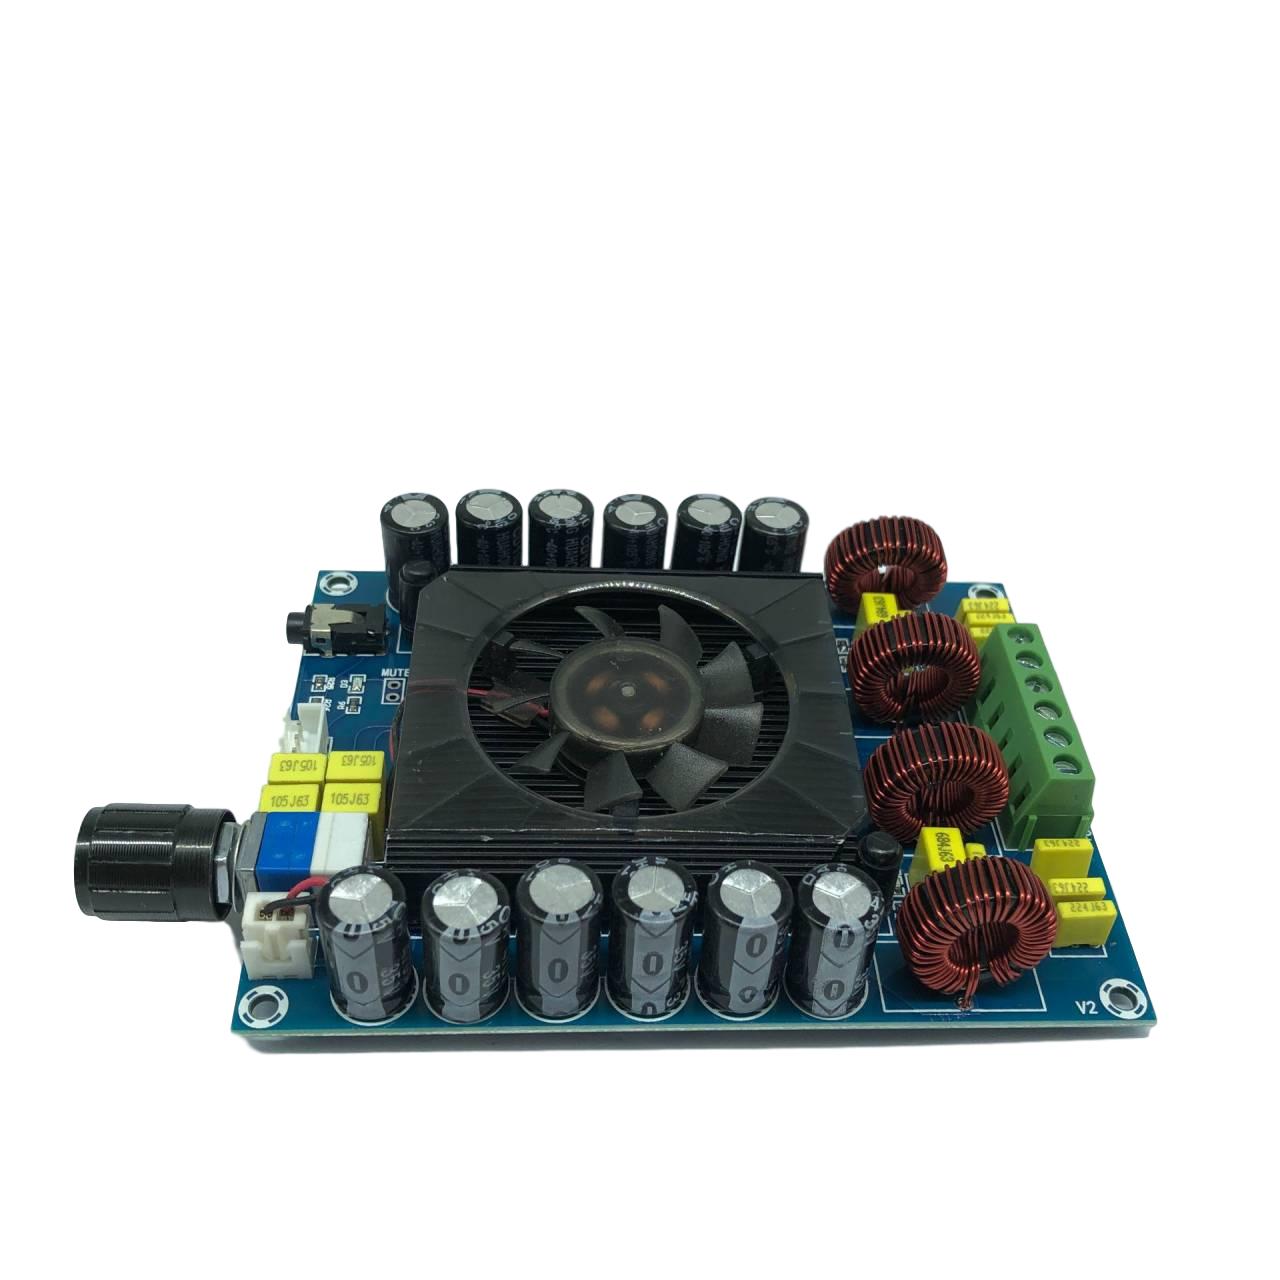 Xh-a121 Power  Amplifier  Board High  Power Digital Power  Amplifier  Board Tda7498e 160wx2 Digital  Amplifier XR-815